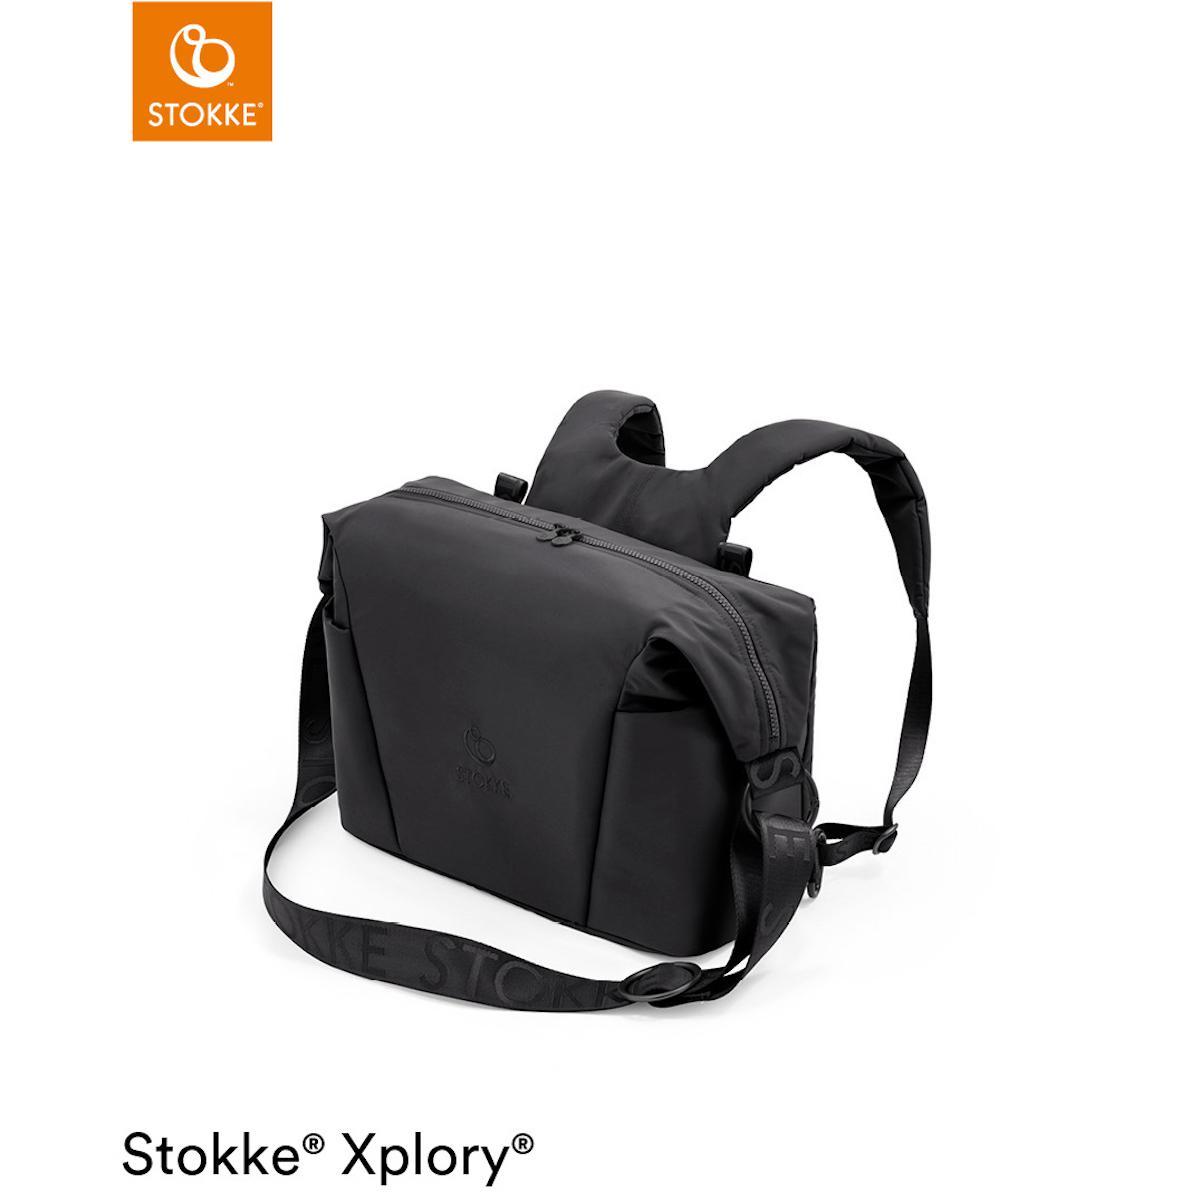 Bolso cambiador XPLORY X Stokke Rich Black